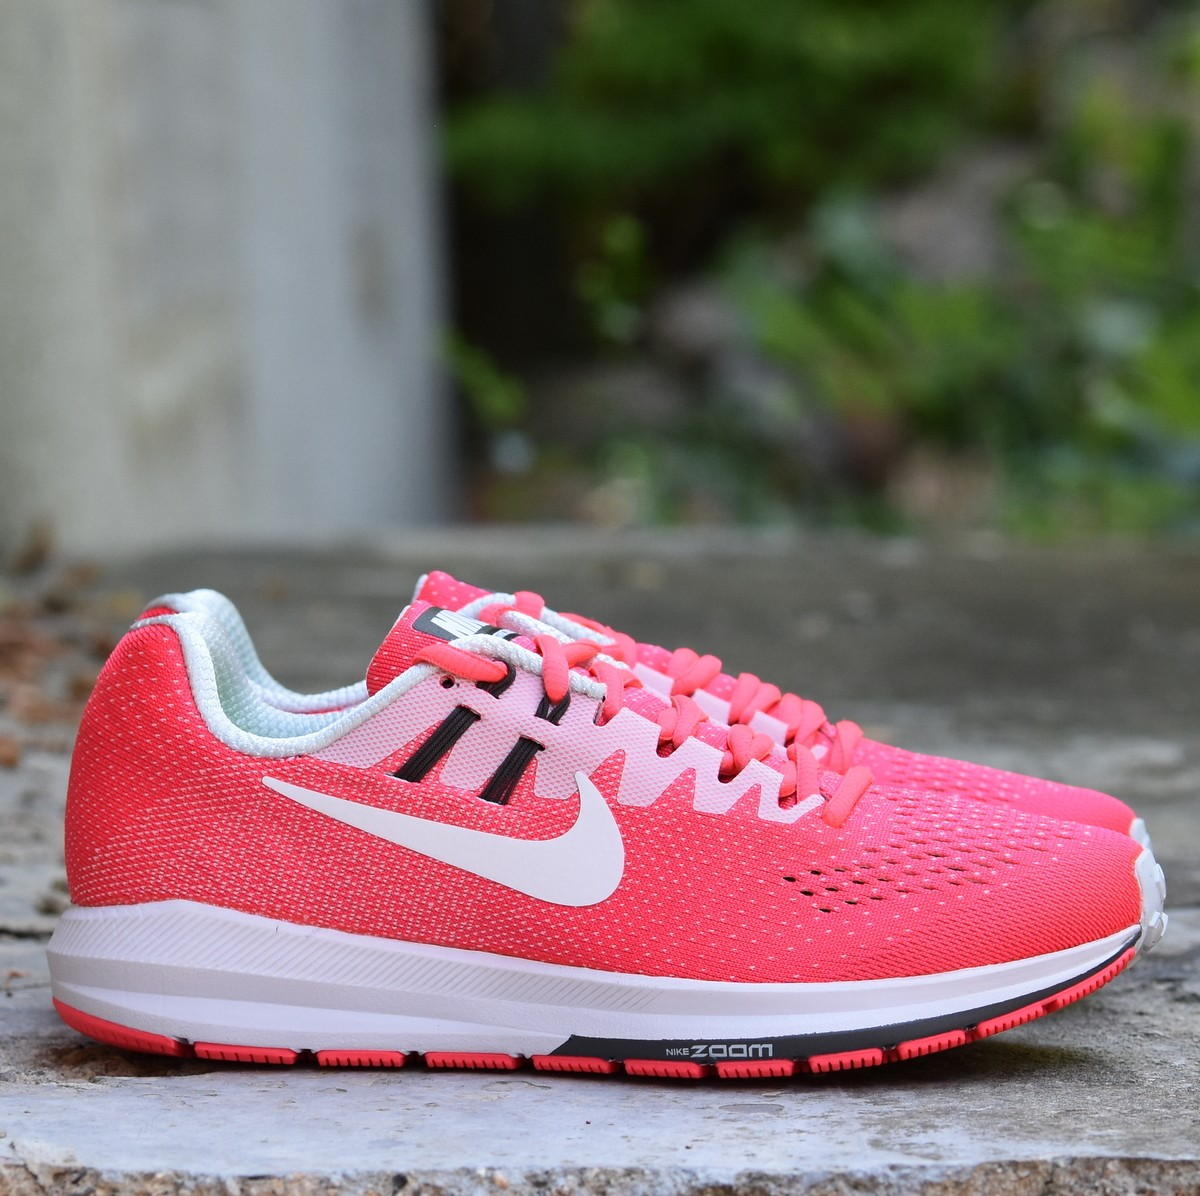 Nike WMNS AIR ZOOM STRUCTURE 20 Dámské boty EU 37.5 849577-601 16691ffe55